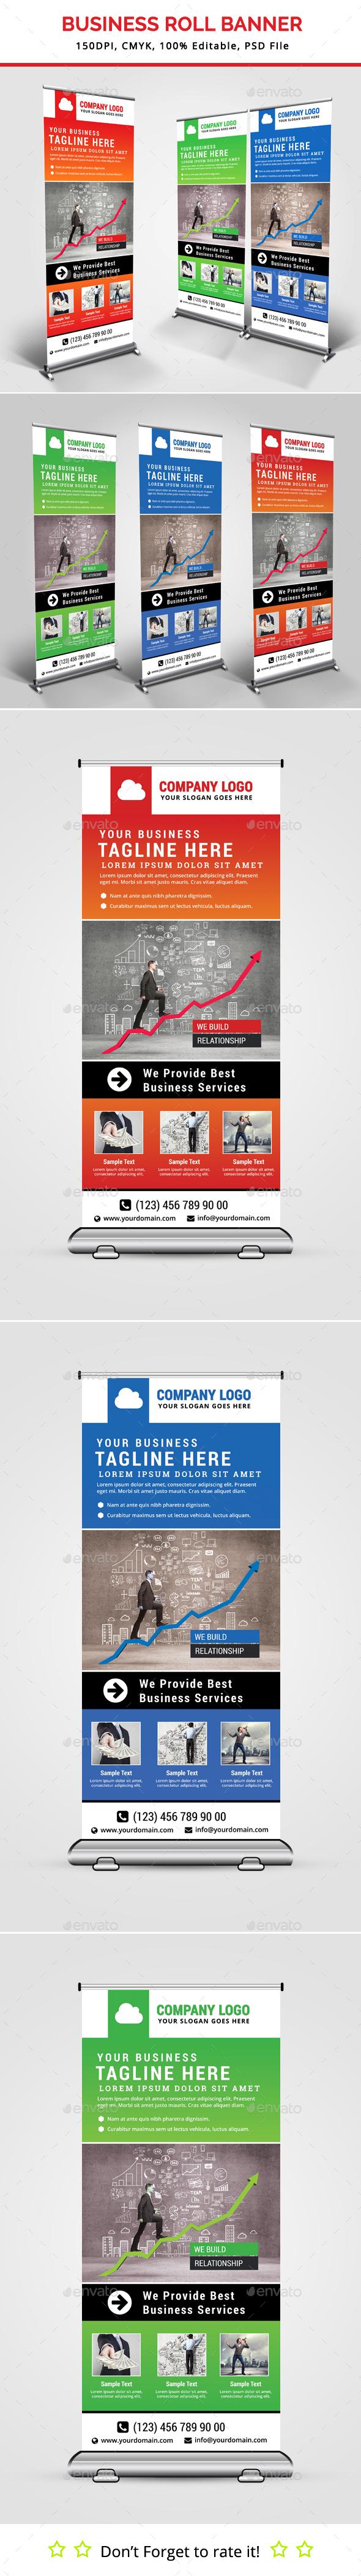 Business Roll Up Banner V22 - Signage Print Templates